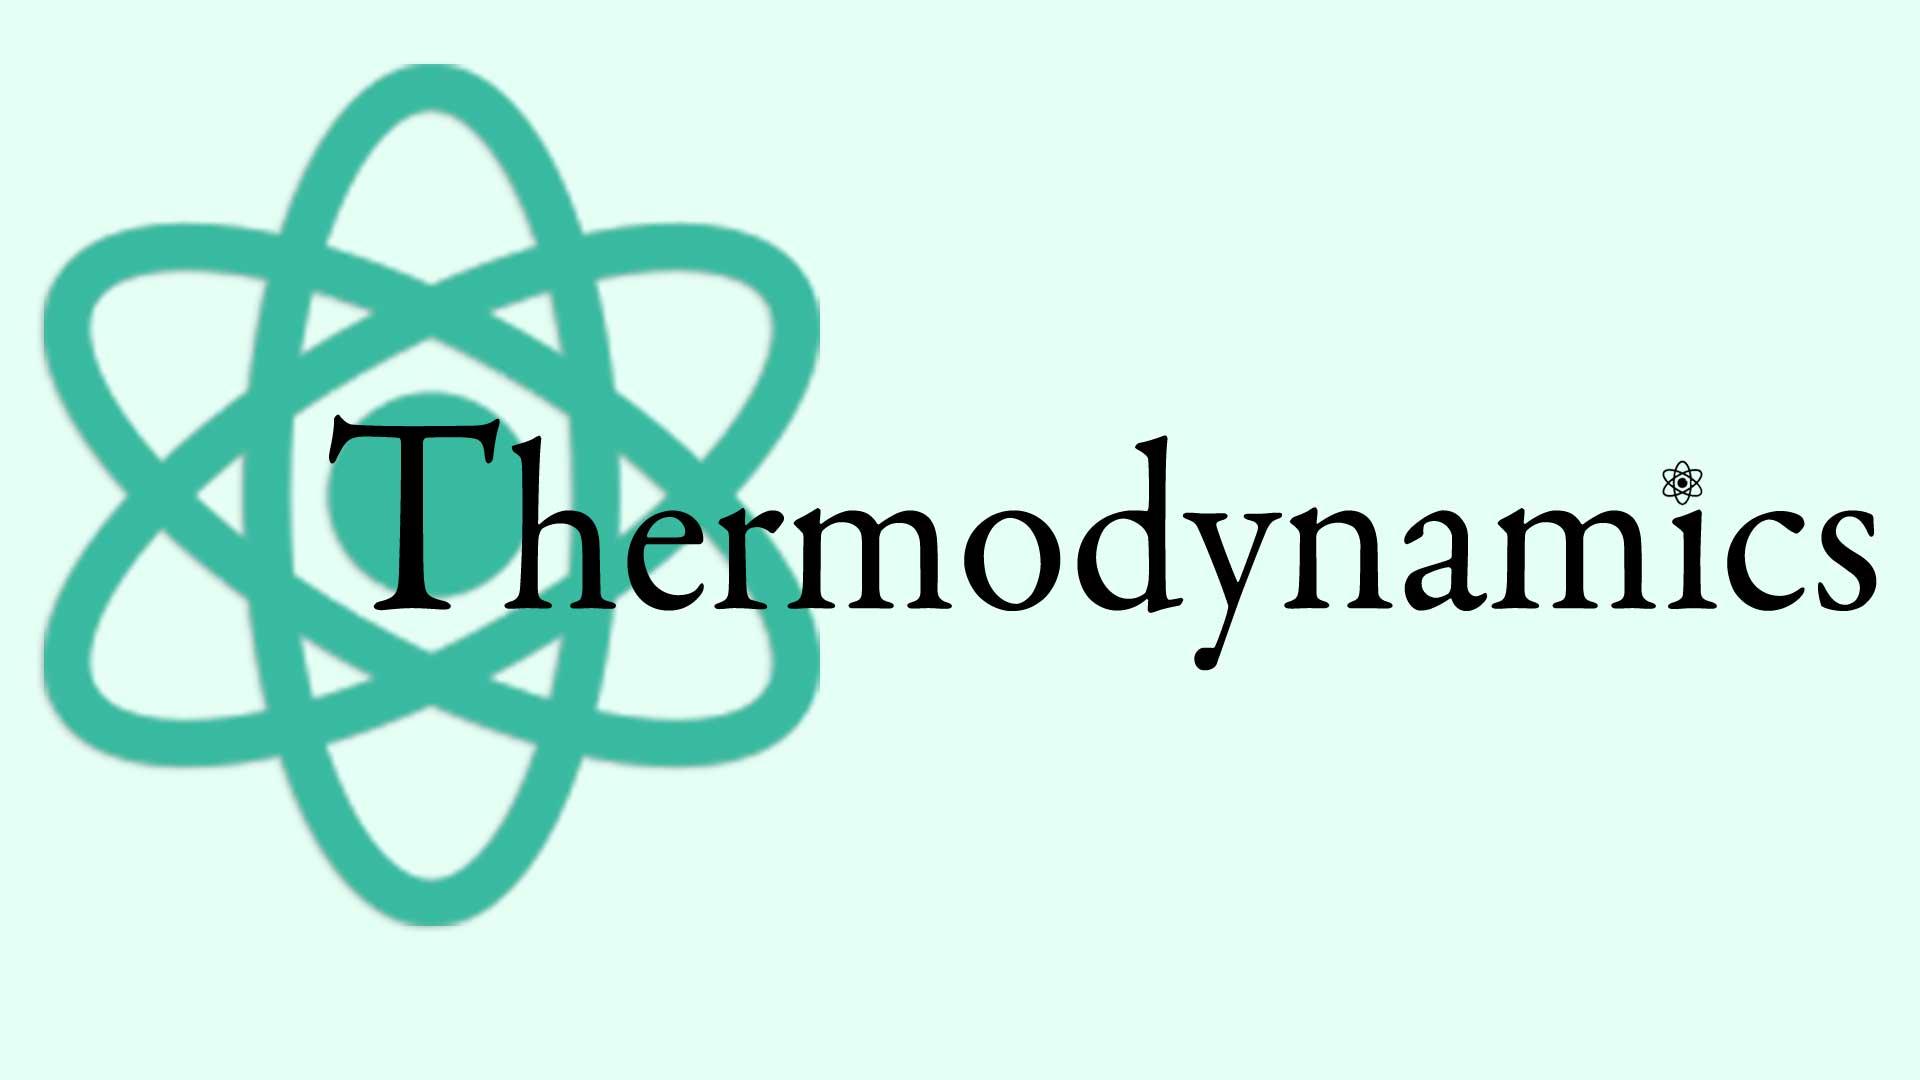 Thermodynamics Graphic with Atom